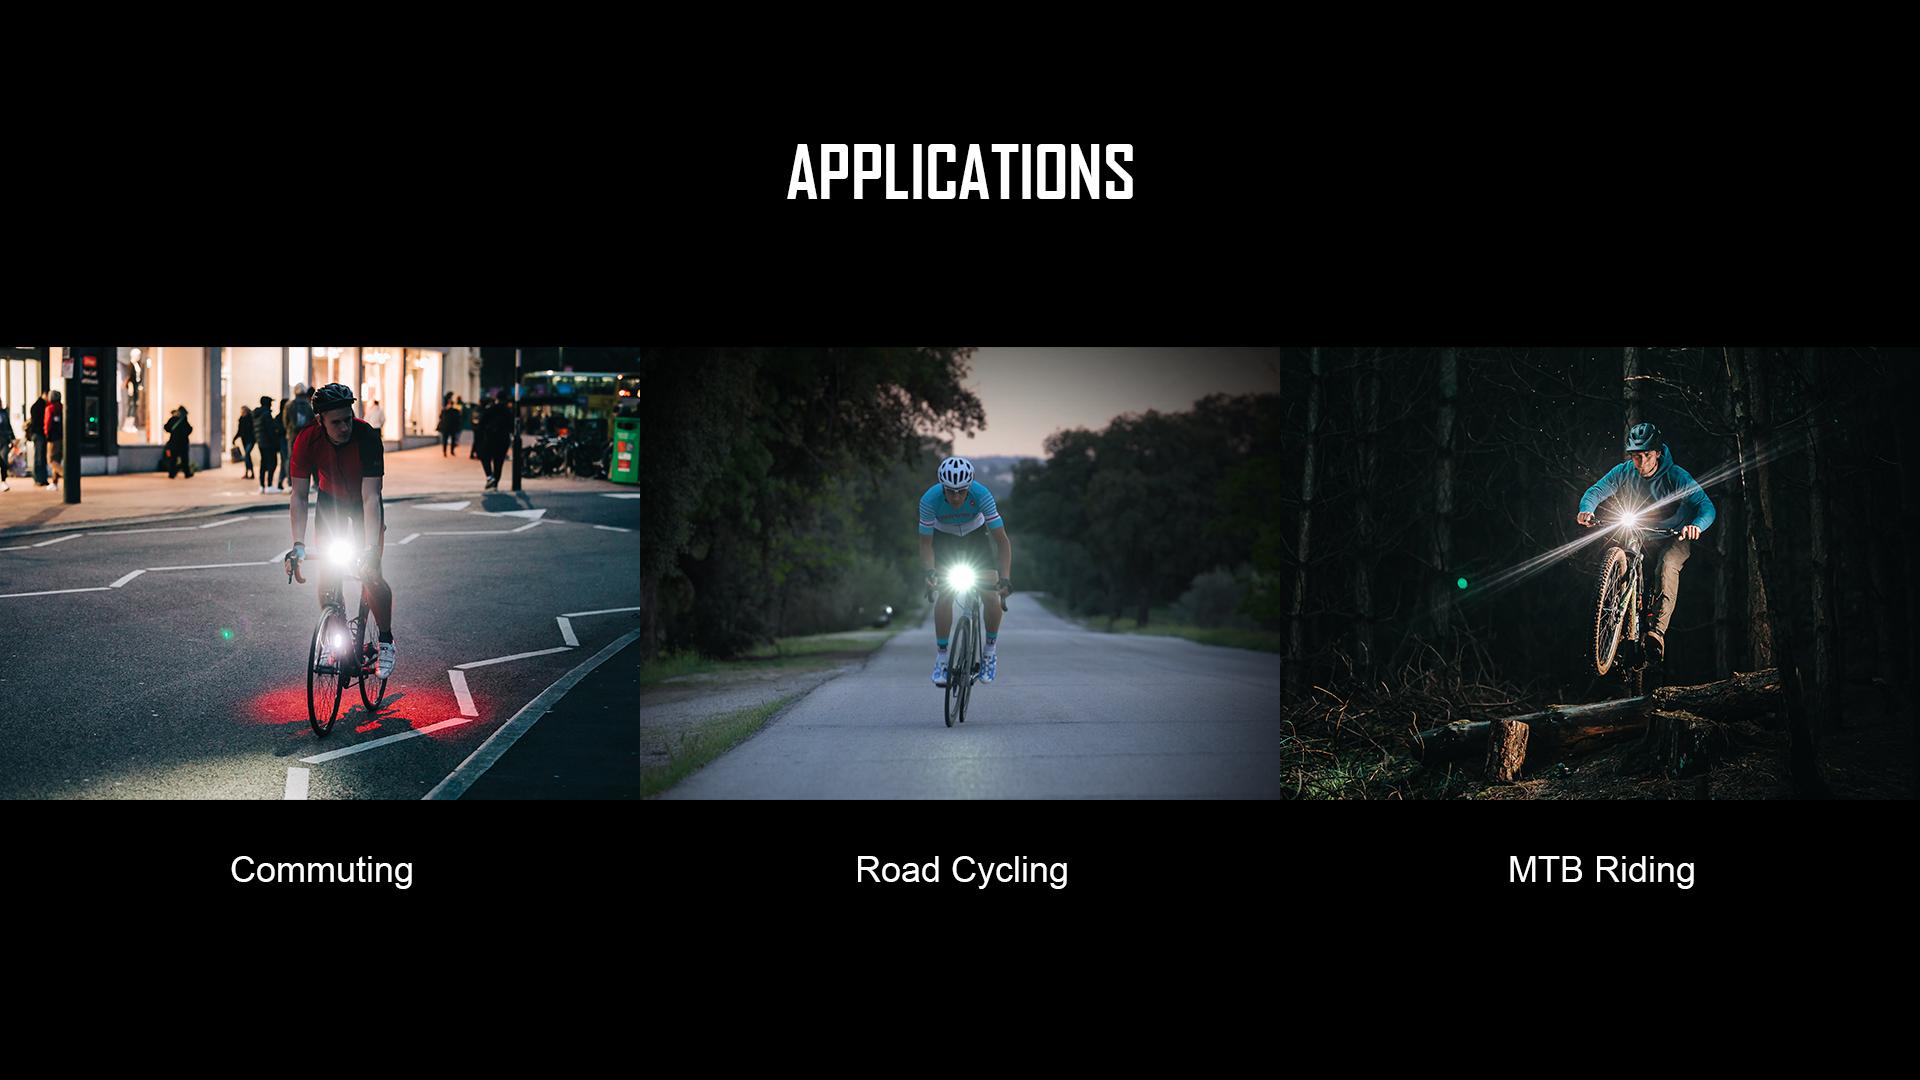 OLIGHT RN1500 BICYCLE LIGHT